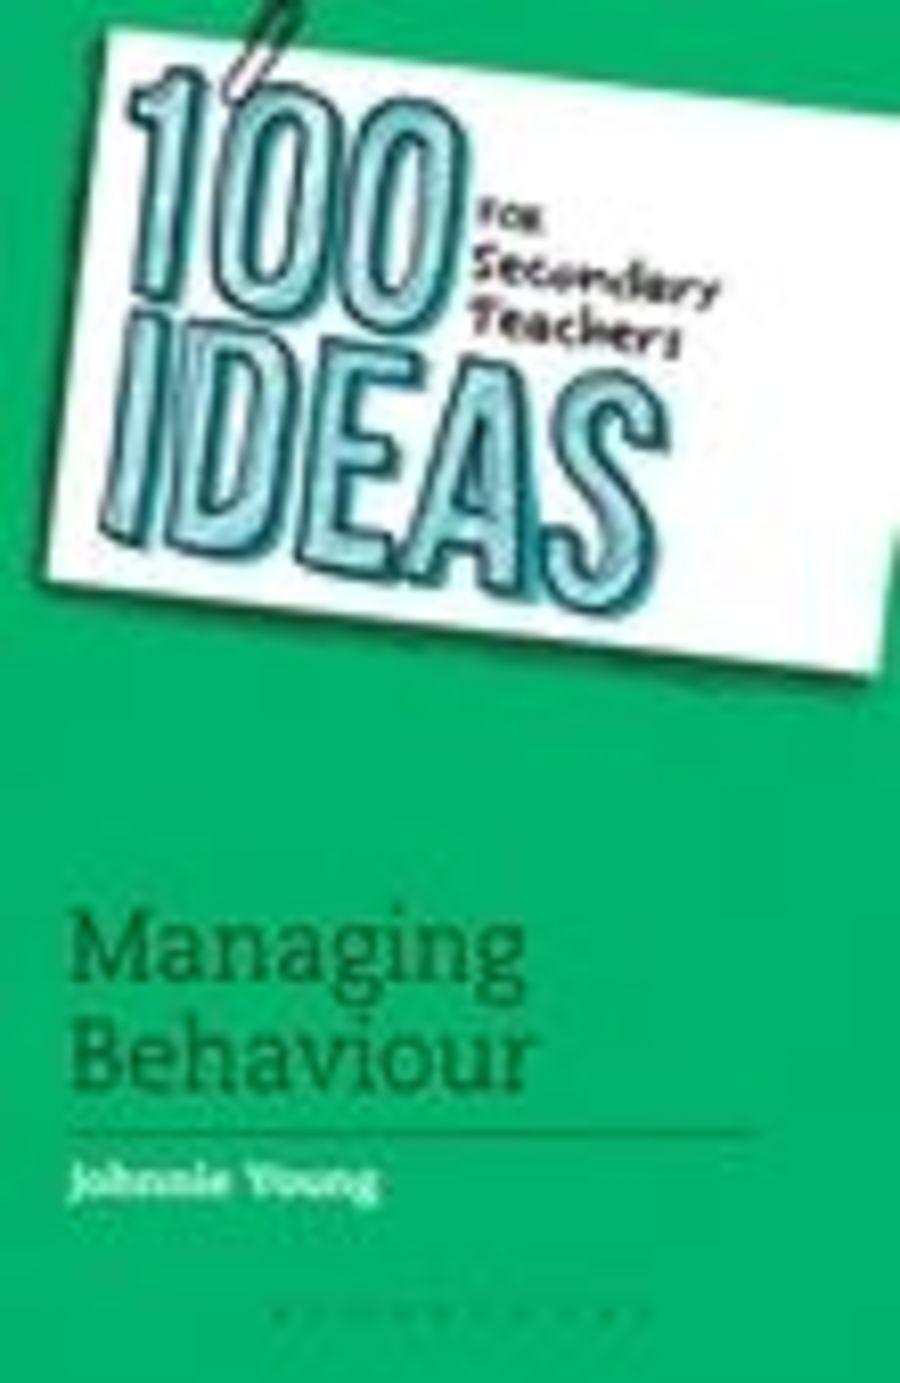 100 Ideas Behaviour Management for Secondary Teachers